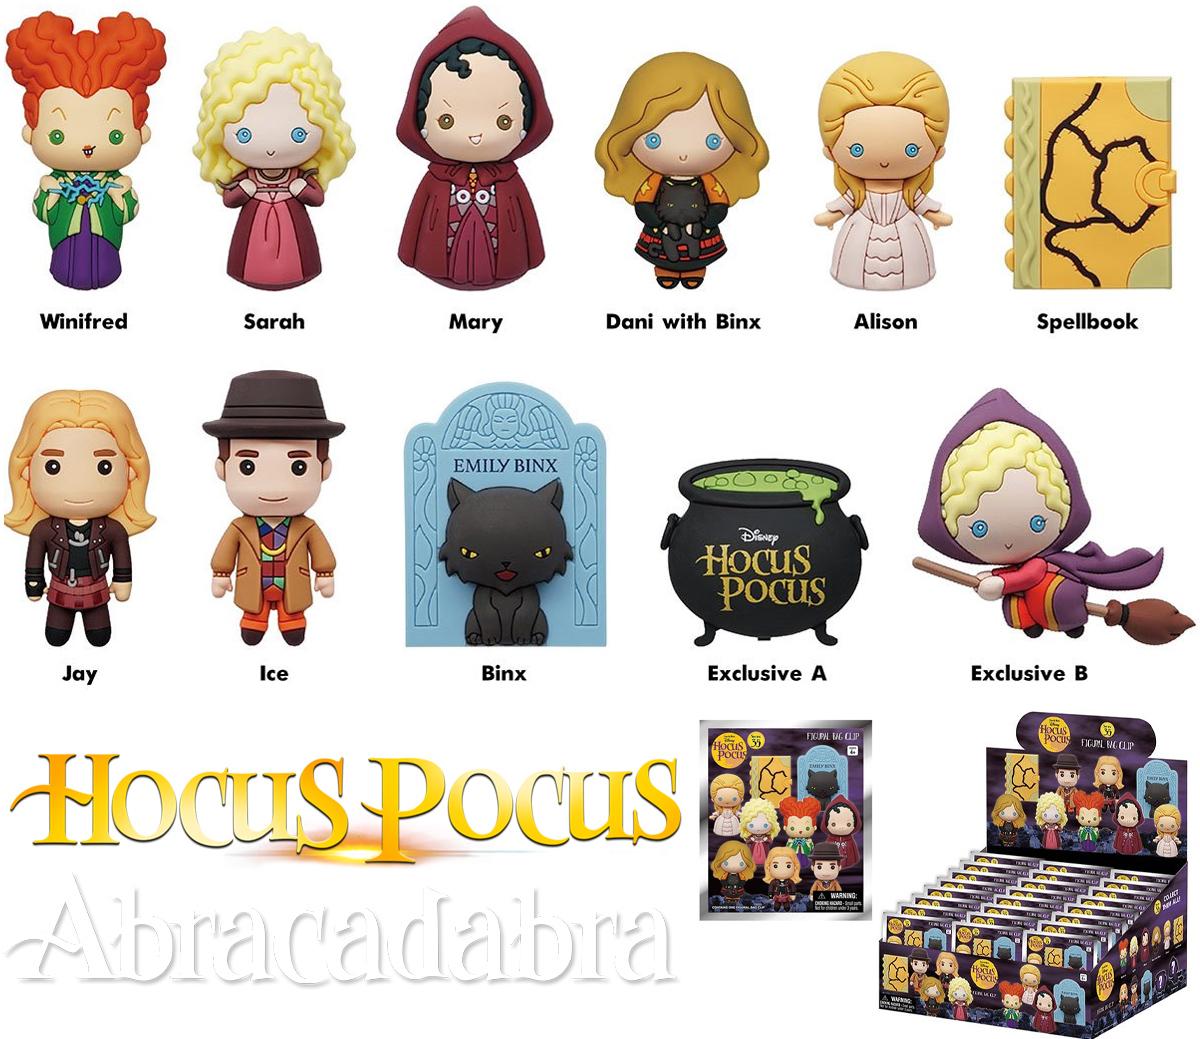 Chaveiros Abracadabra (Hocus Pocus) Disney 3D Figural Bag Clip (Blind-Bag)